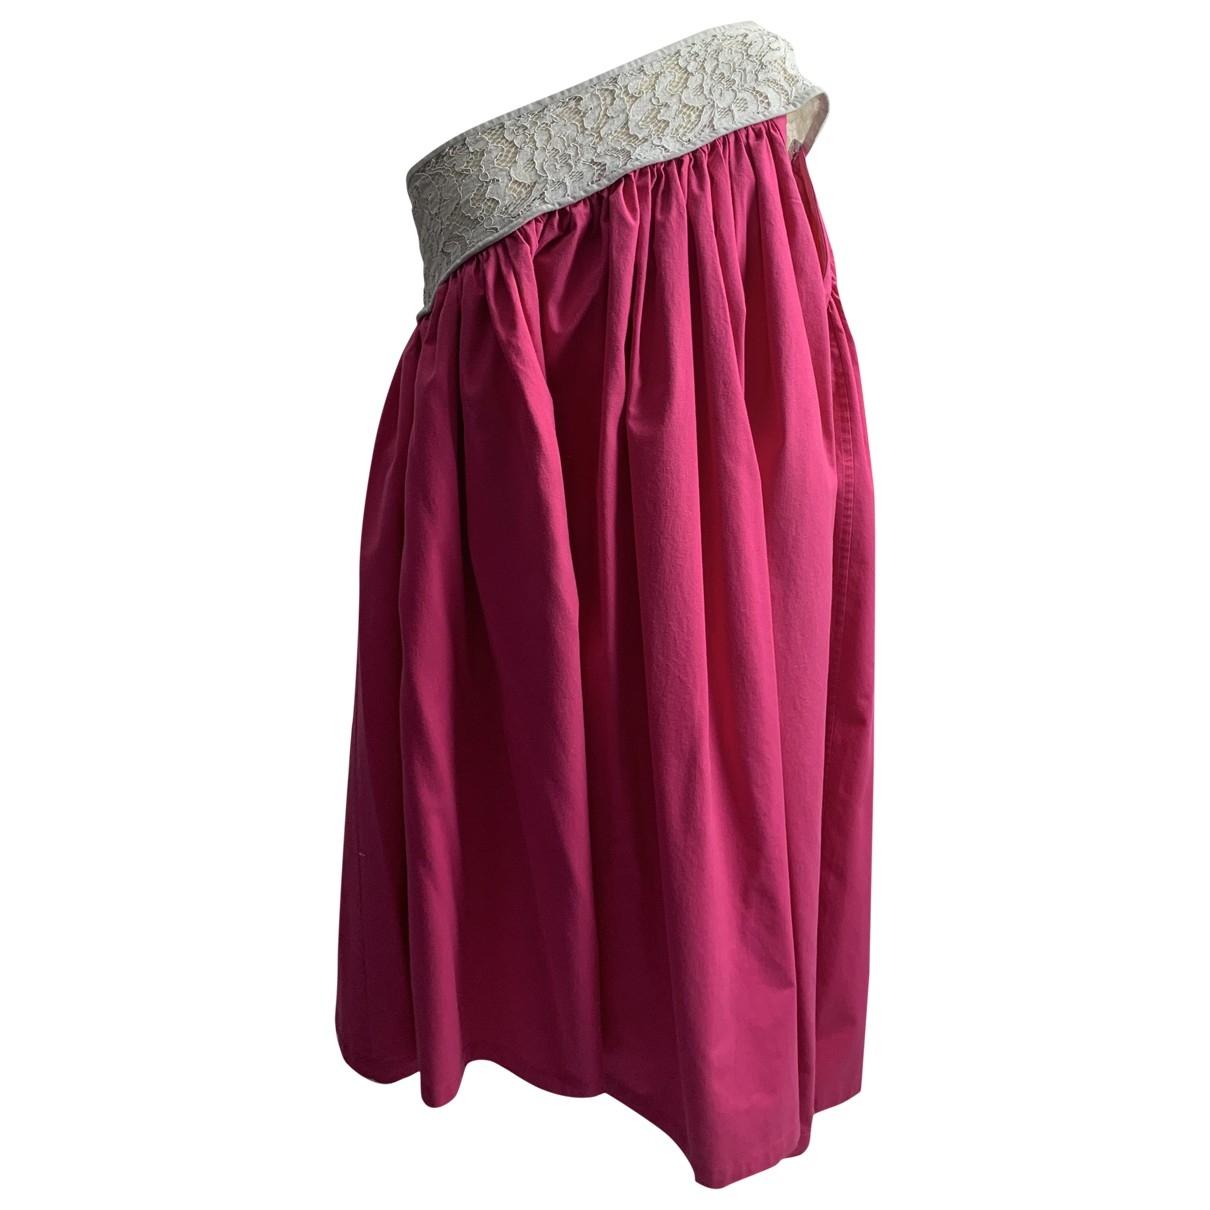 Yves Saint Laurent \N Pink Cotton dress for Women 42 FR